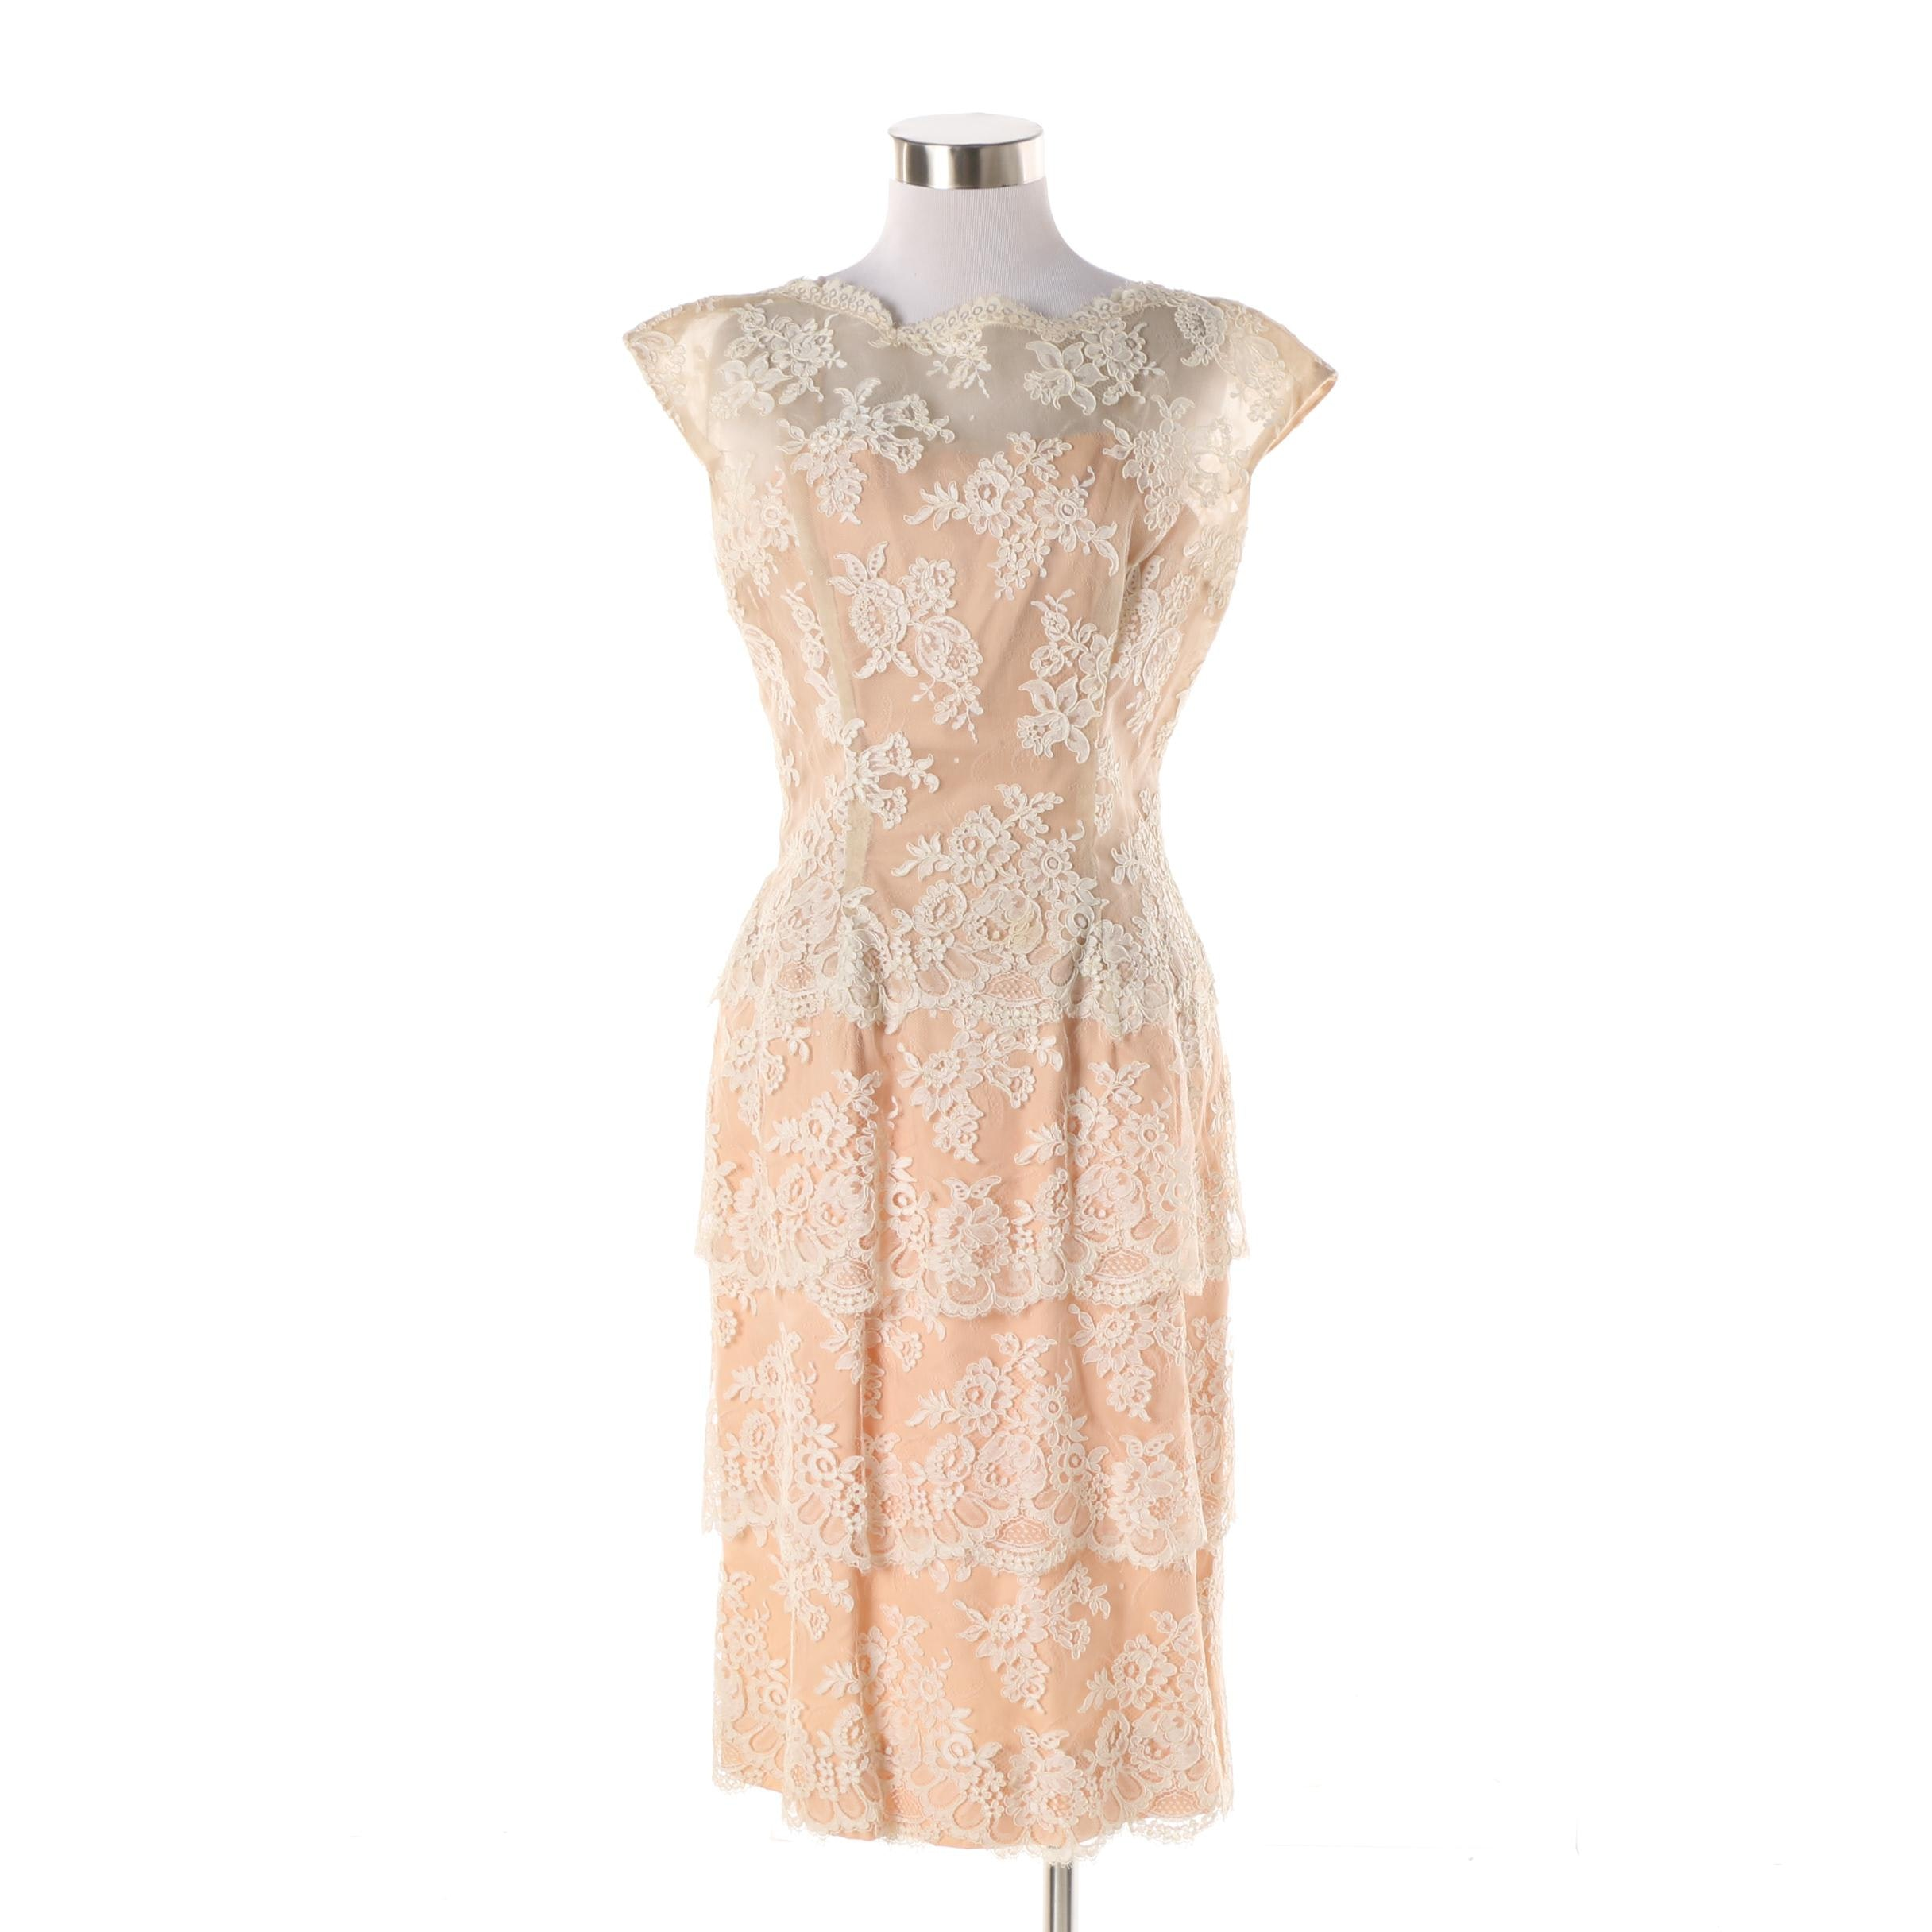 1950s Vintage Mr. Frank New York Original Tiered Lace Cocktail Dress